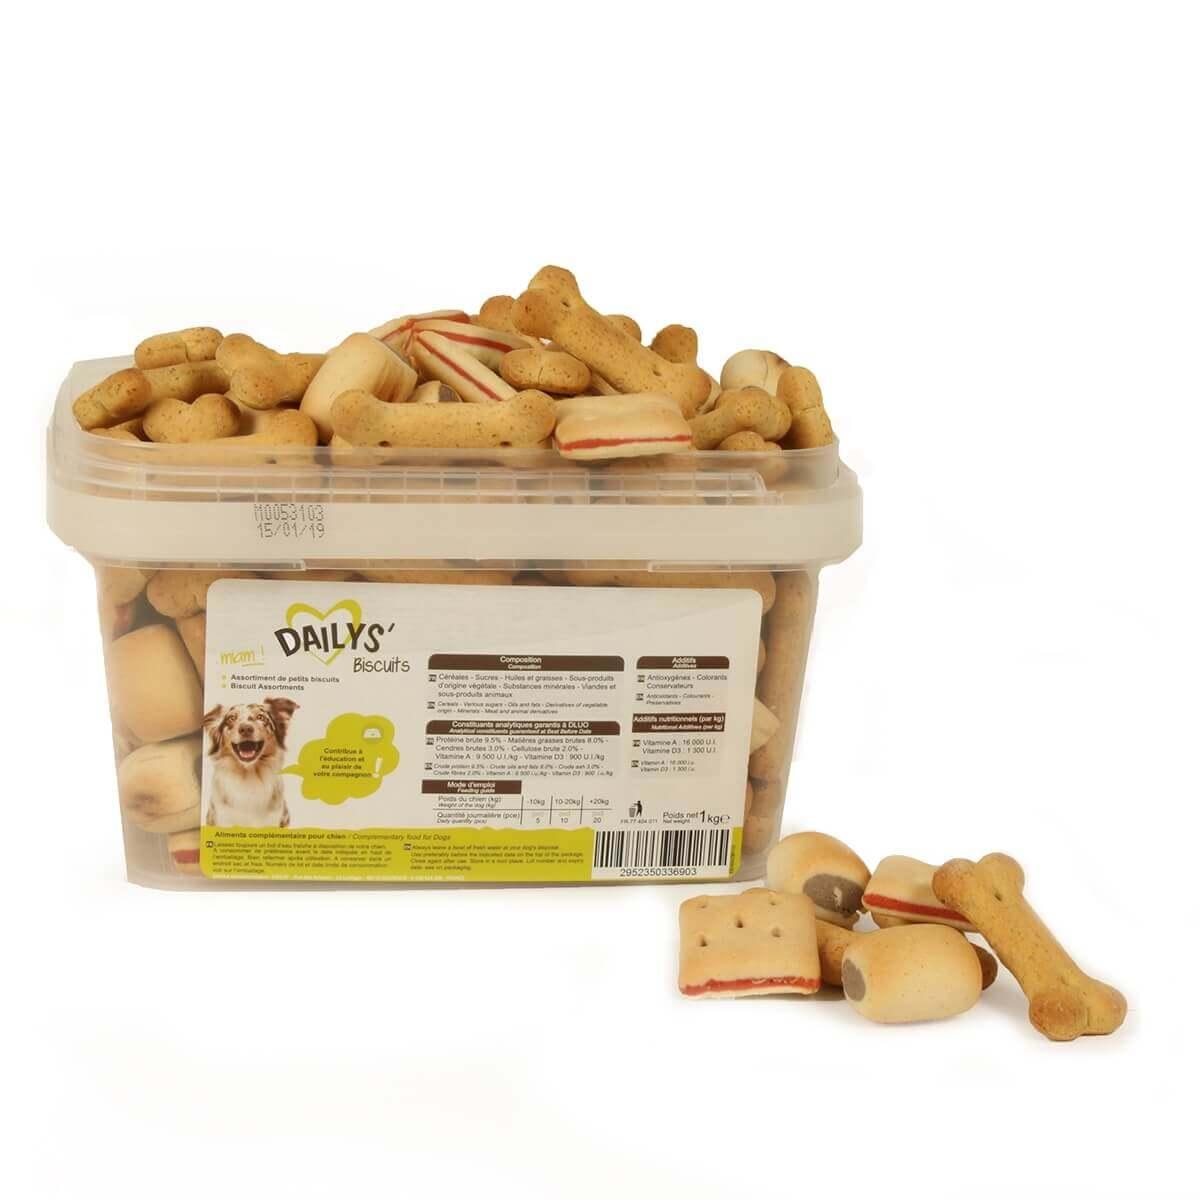 Biscuits assortis DAILYS pour chien 1kg_0